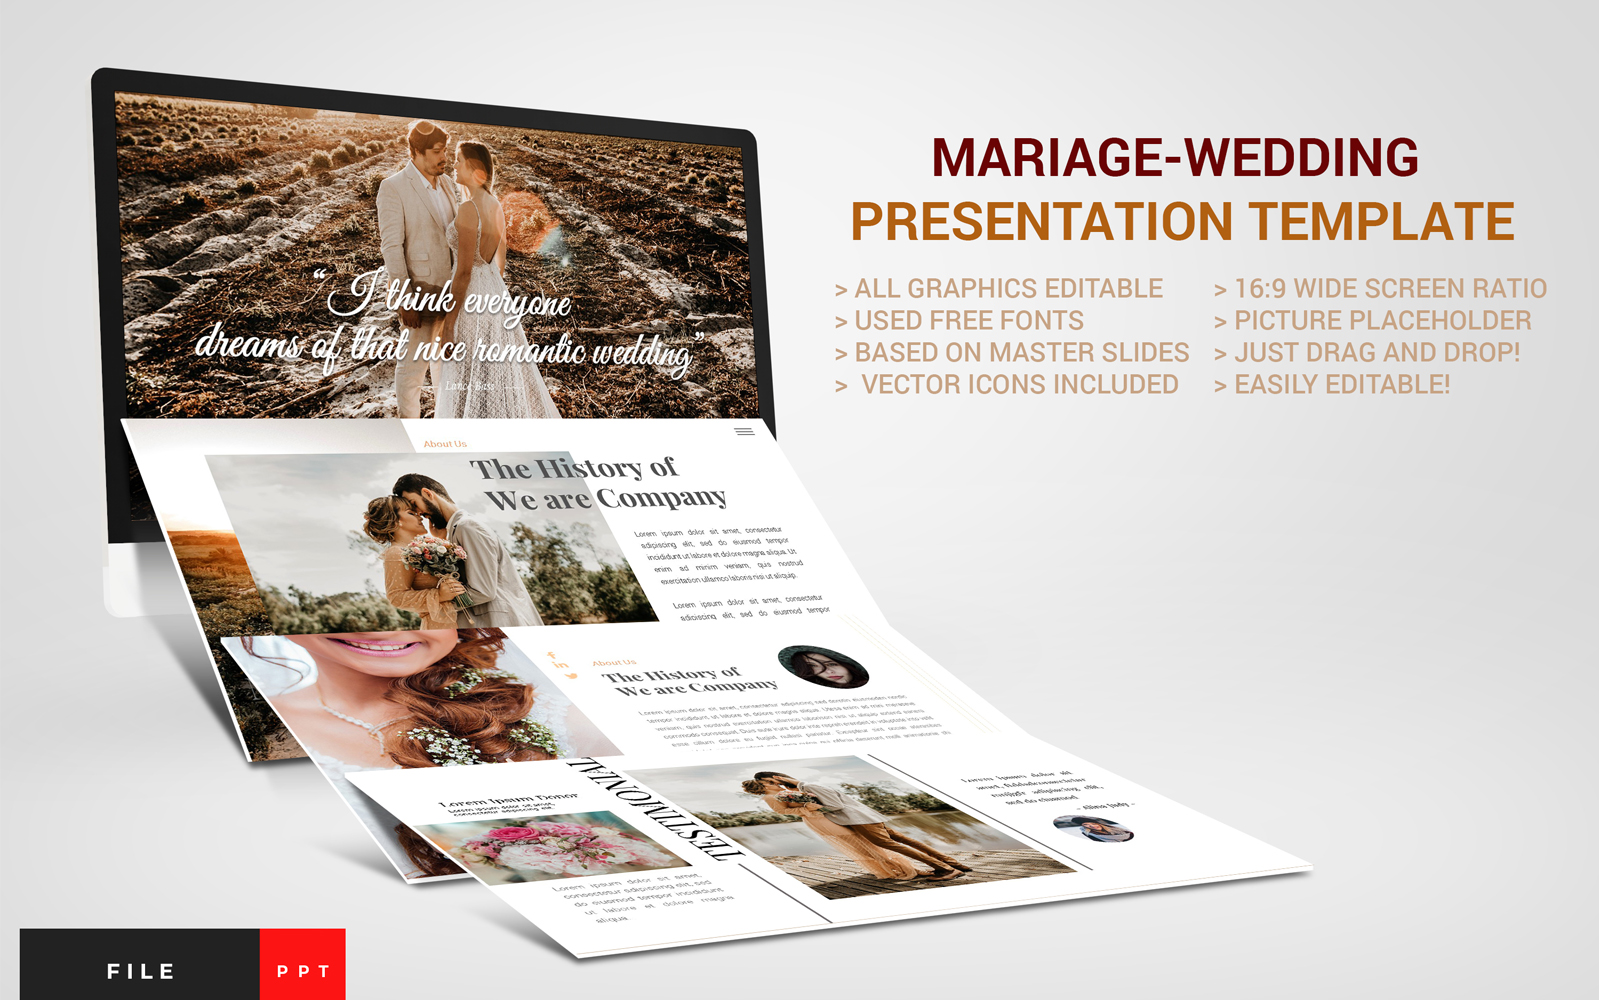 Mariage-Wedding Presentation PowerPoint Template